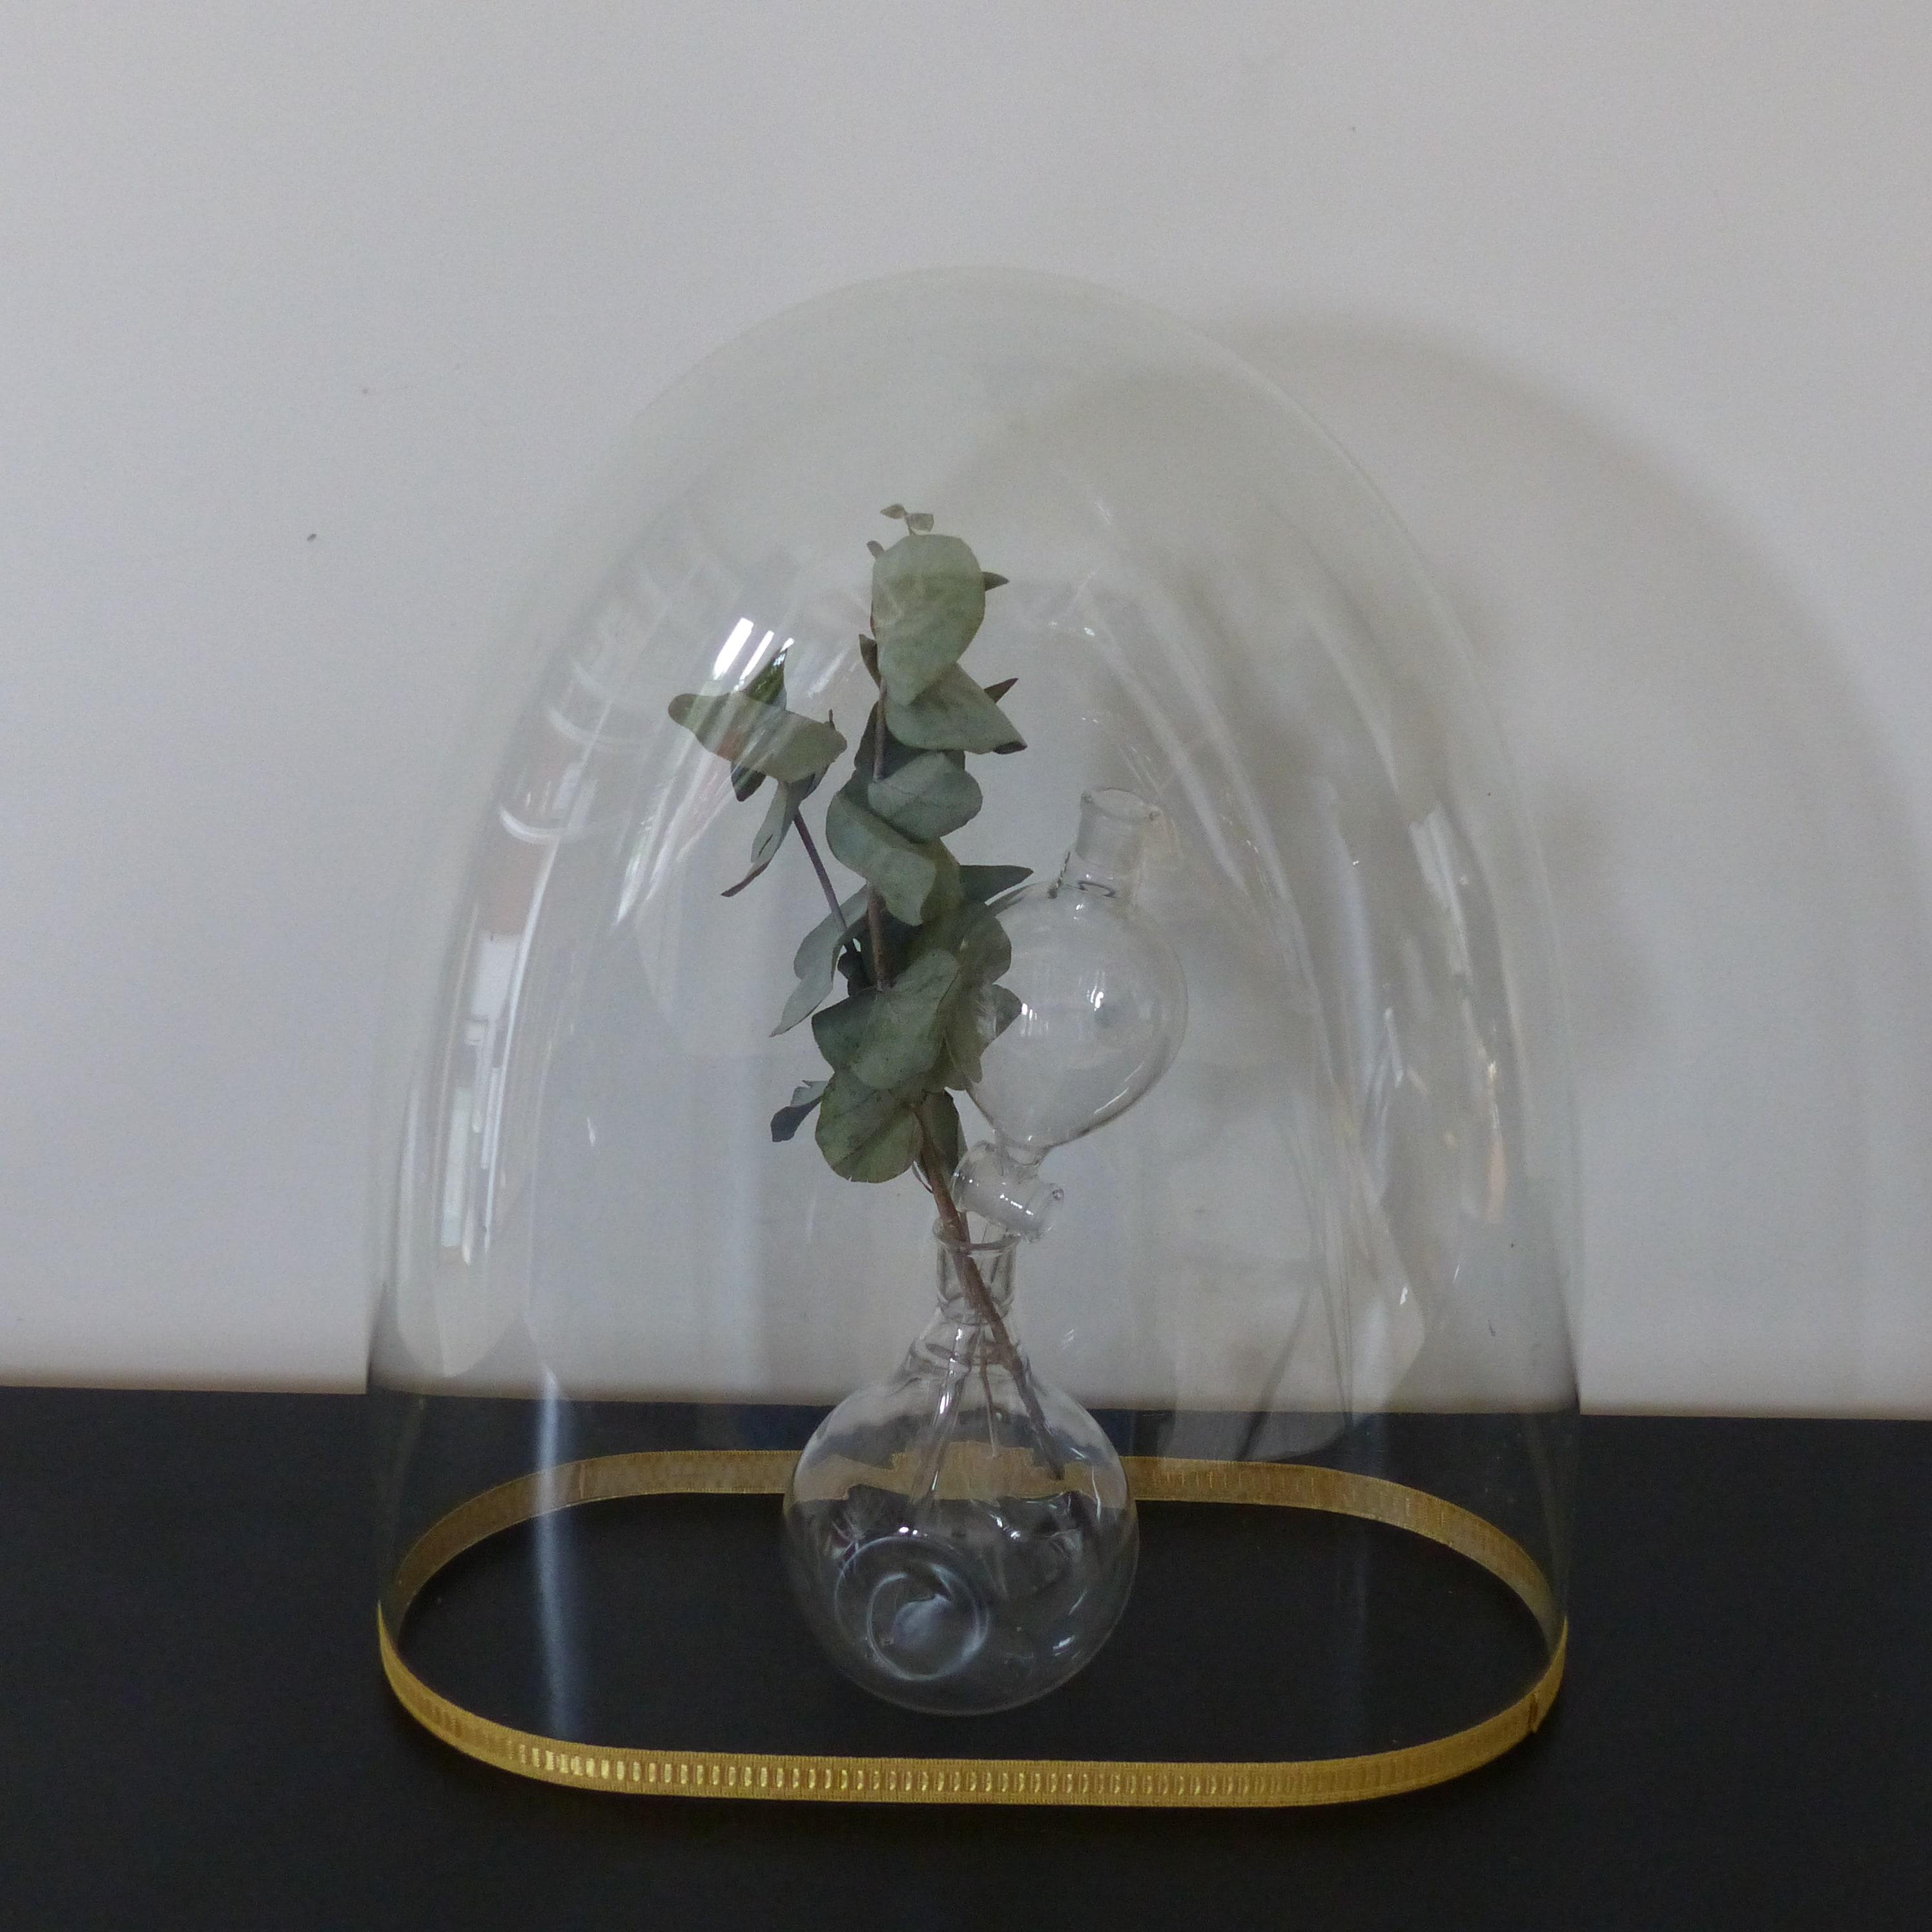 globe de mari e en verre lignedebrocante brocante en ligne chine pour vous meubles vintage. Black Bedroom Furniture Sets. Home Design Ideas